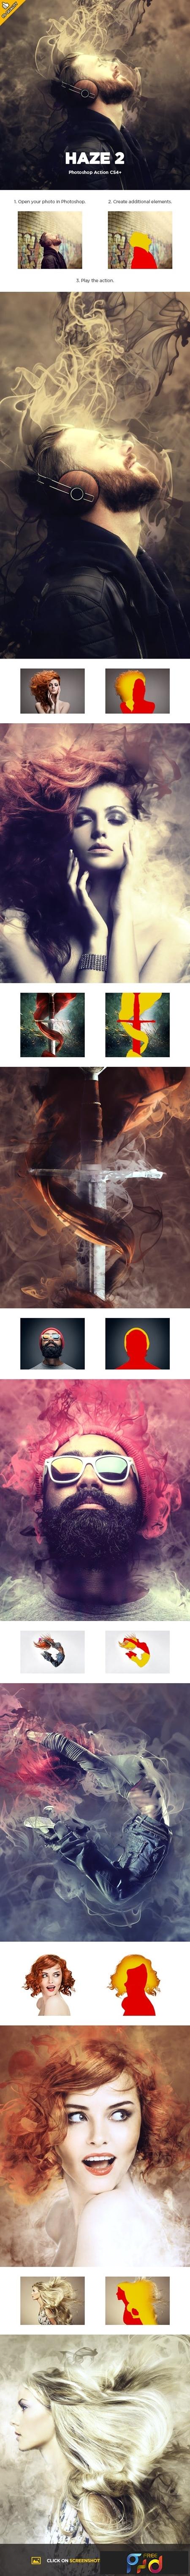 Haze 2 CS4+ Photoshop Action 23310795 1